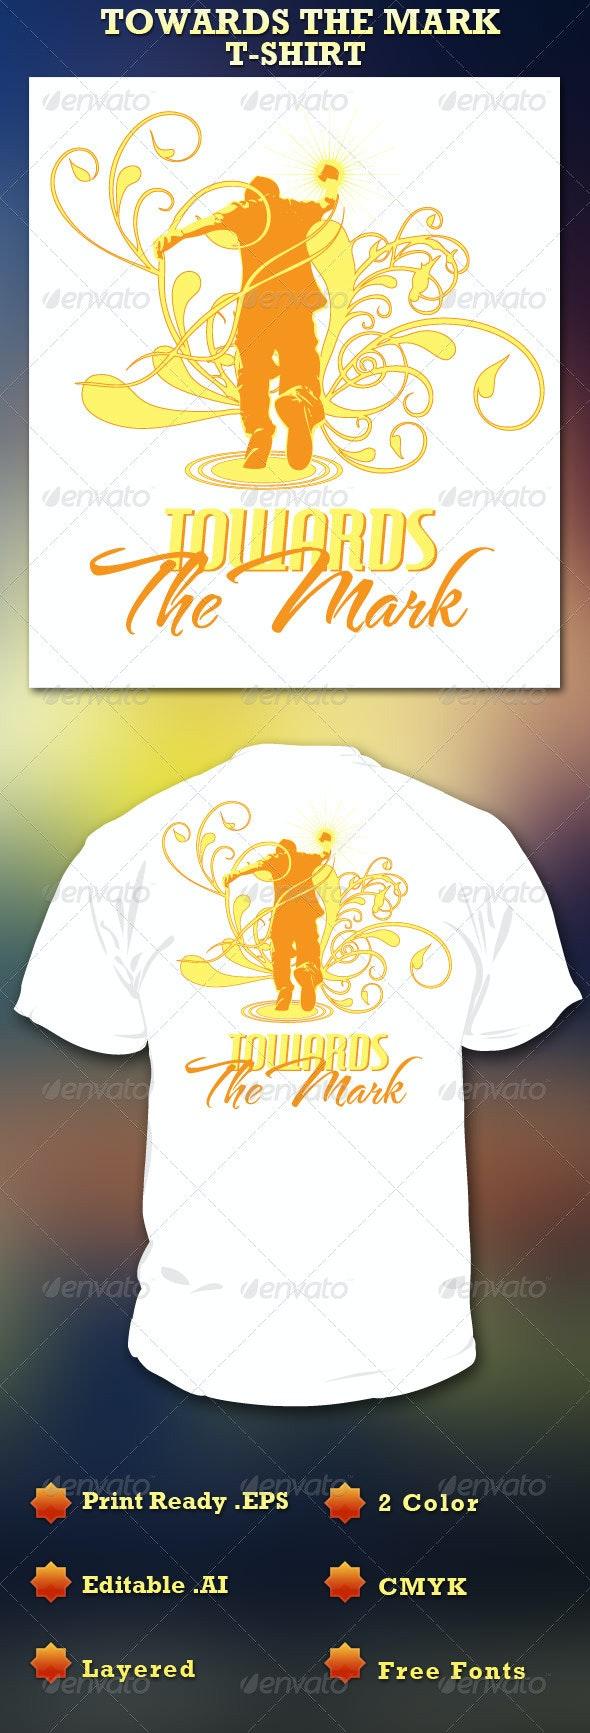 Towards the Mark T-Shirt Template - Church T-Shirts